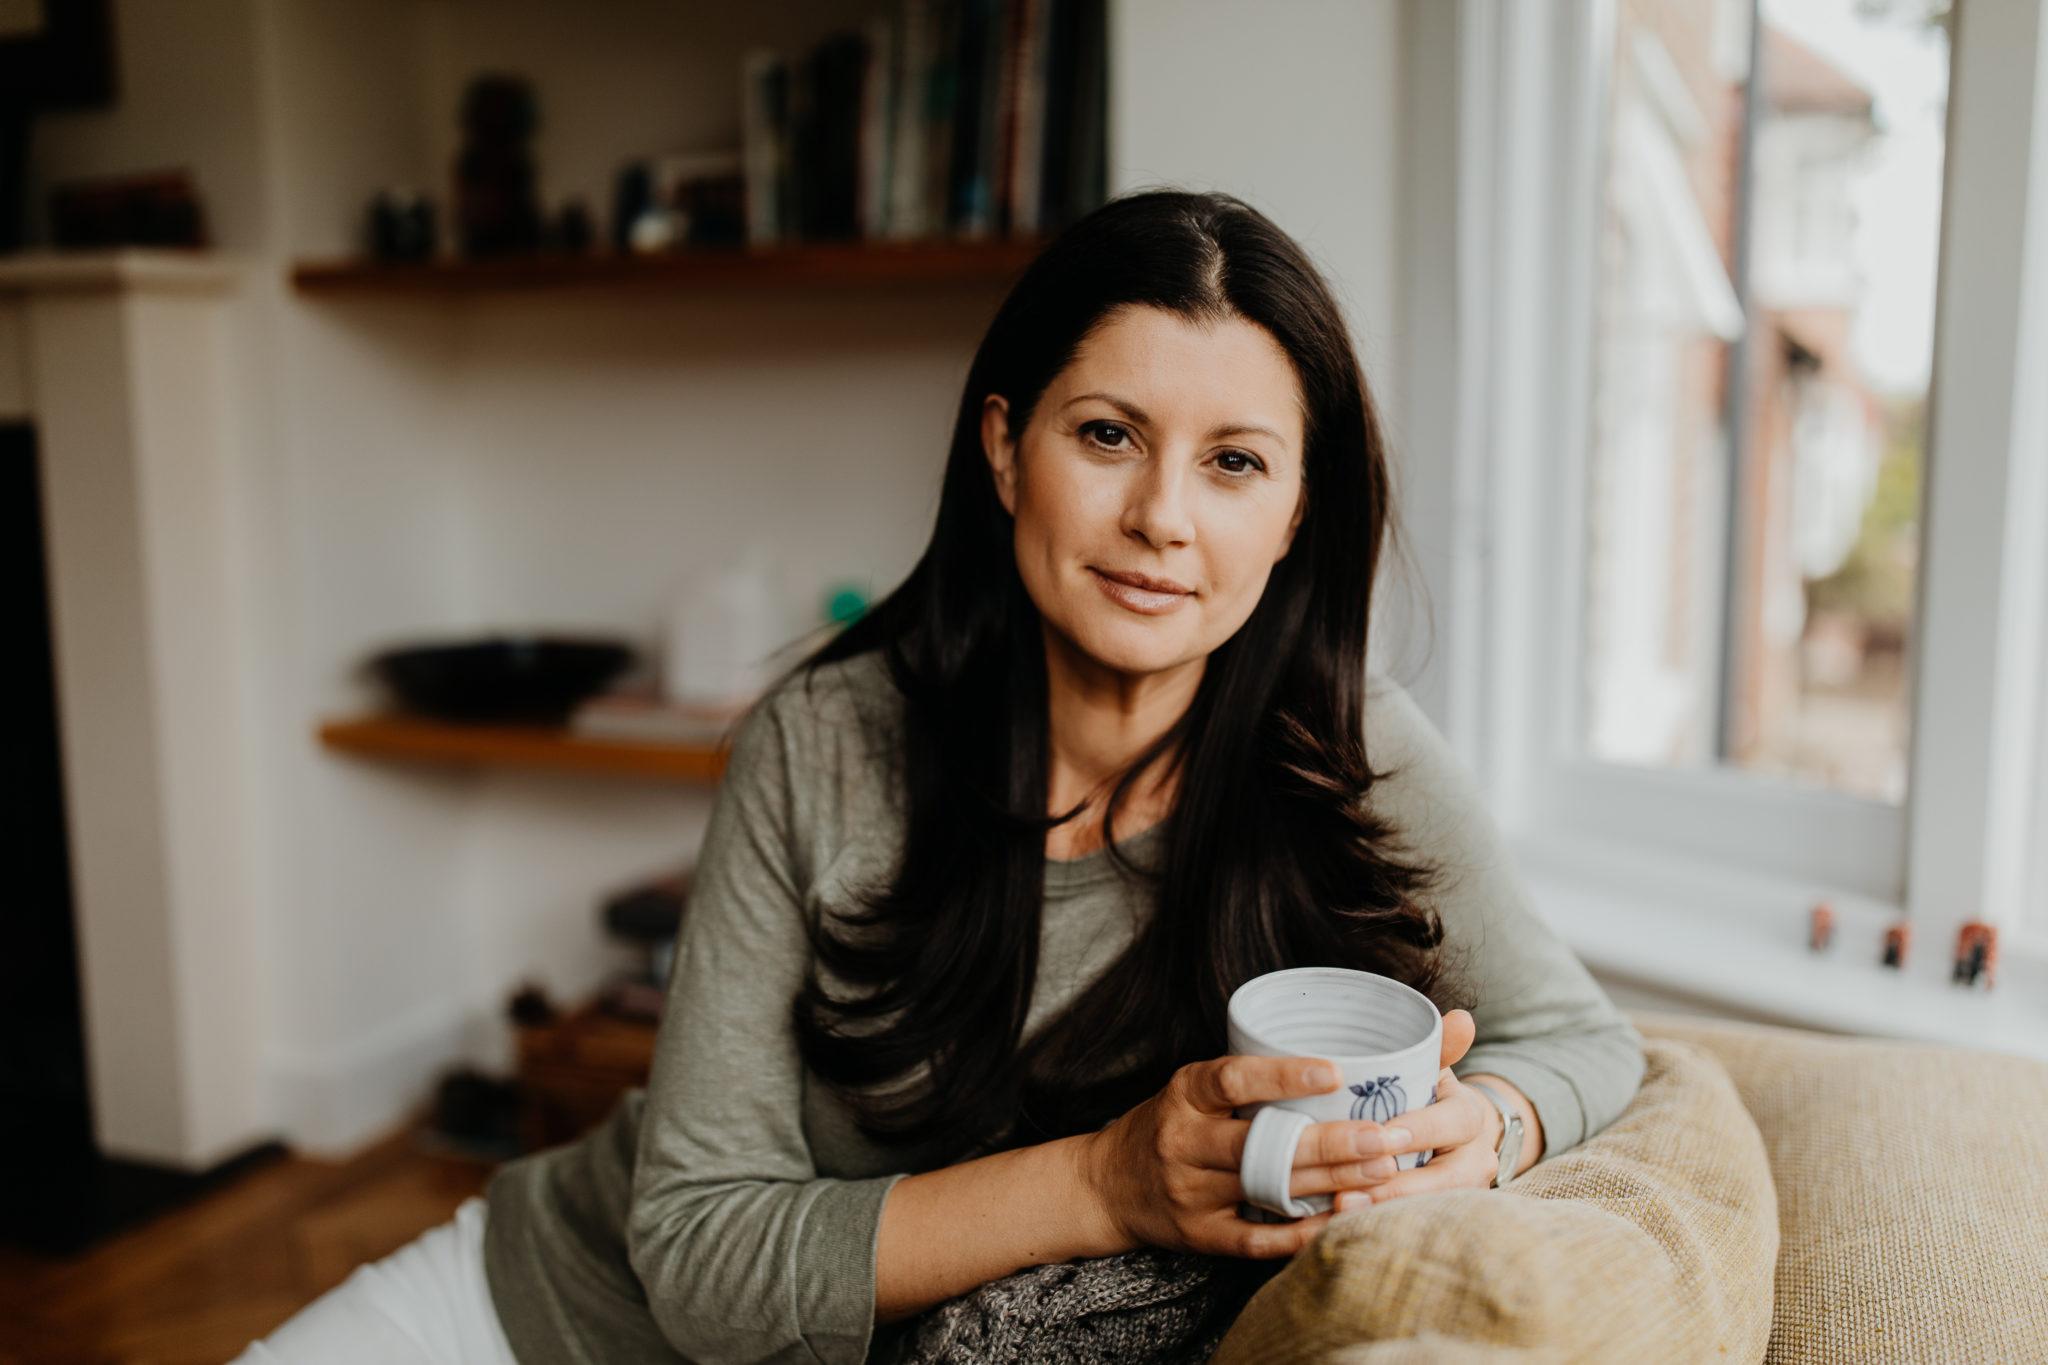 Over 40s health with Thalia Pellegrini, The Knackered Mum Nutritionist